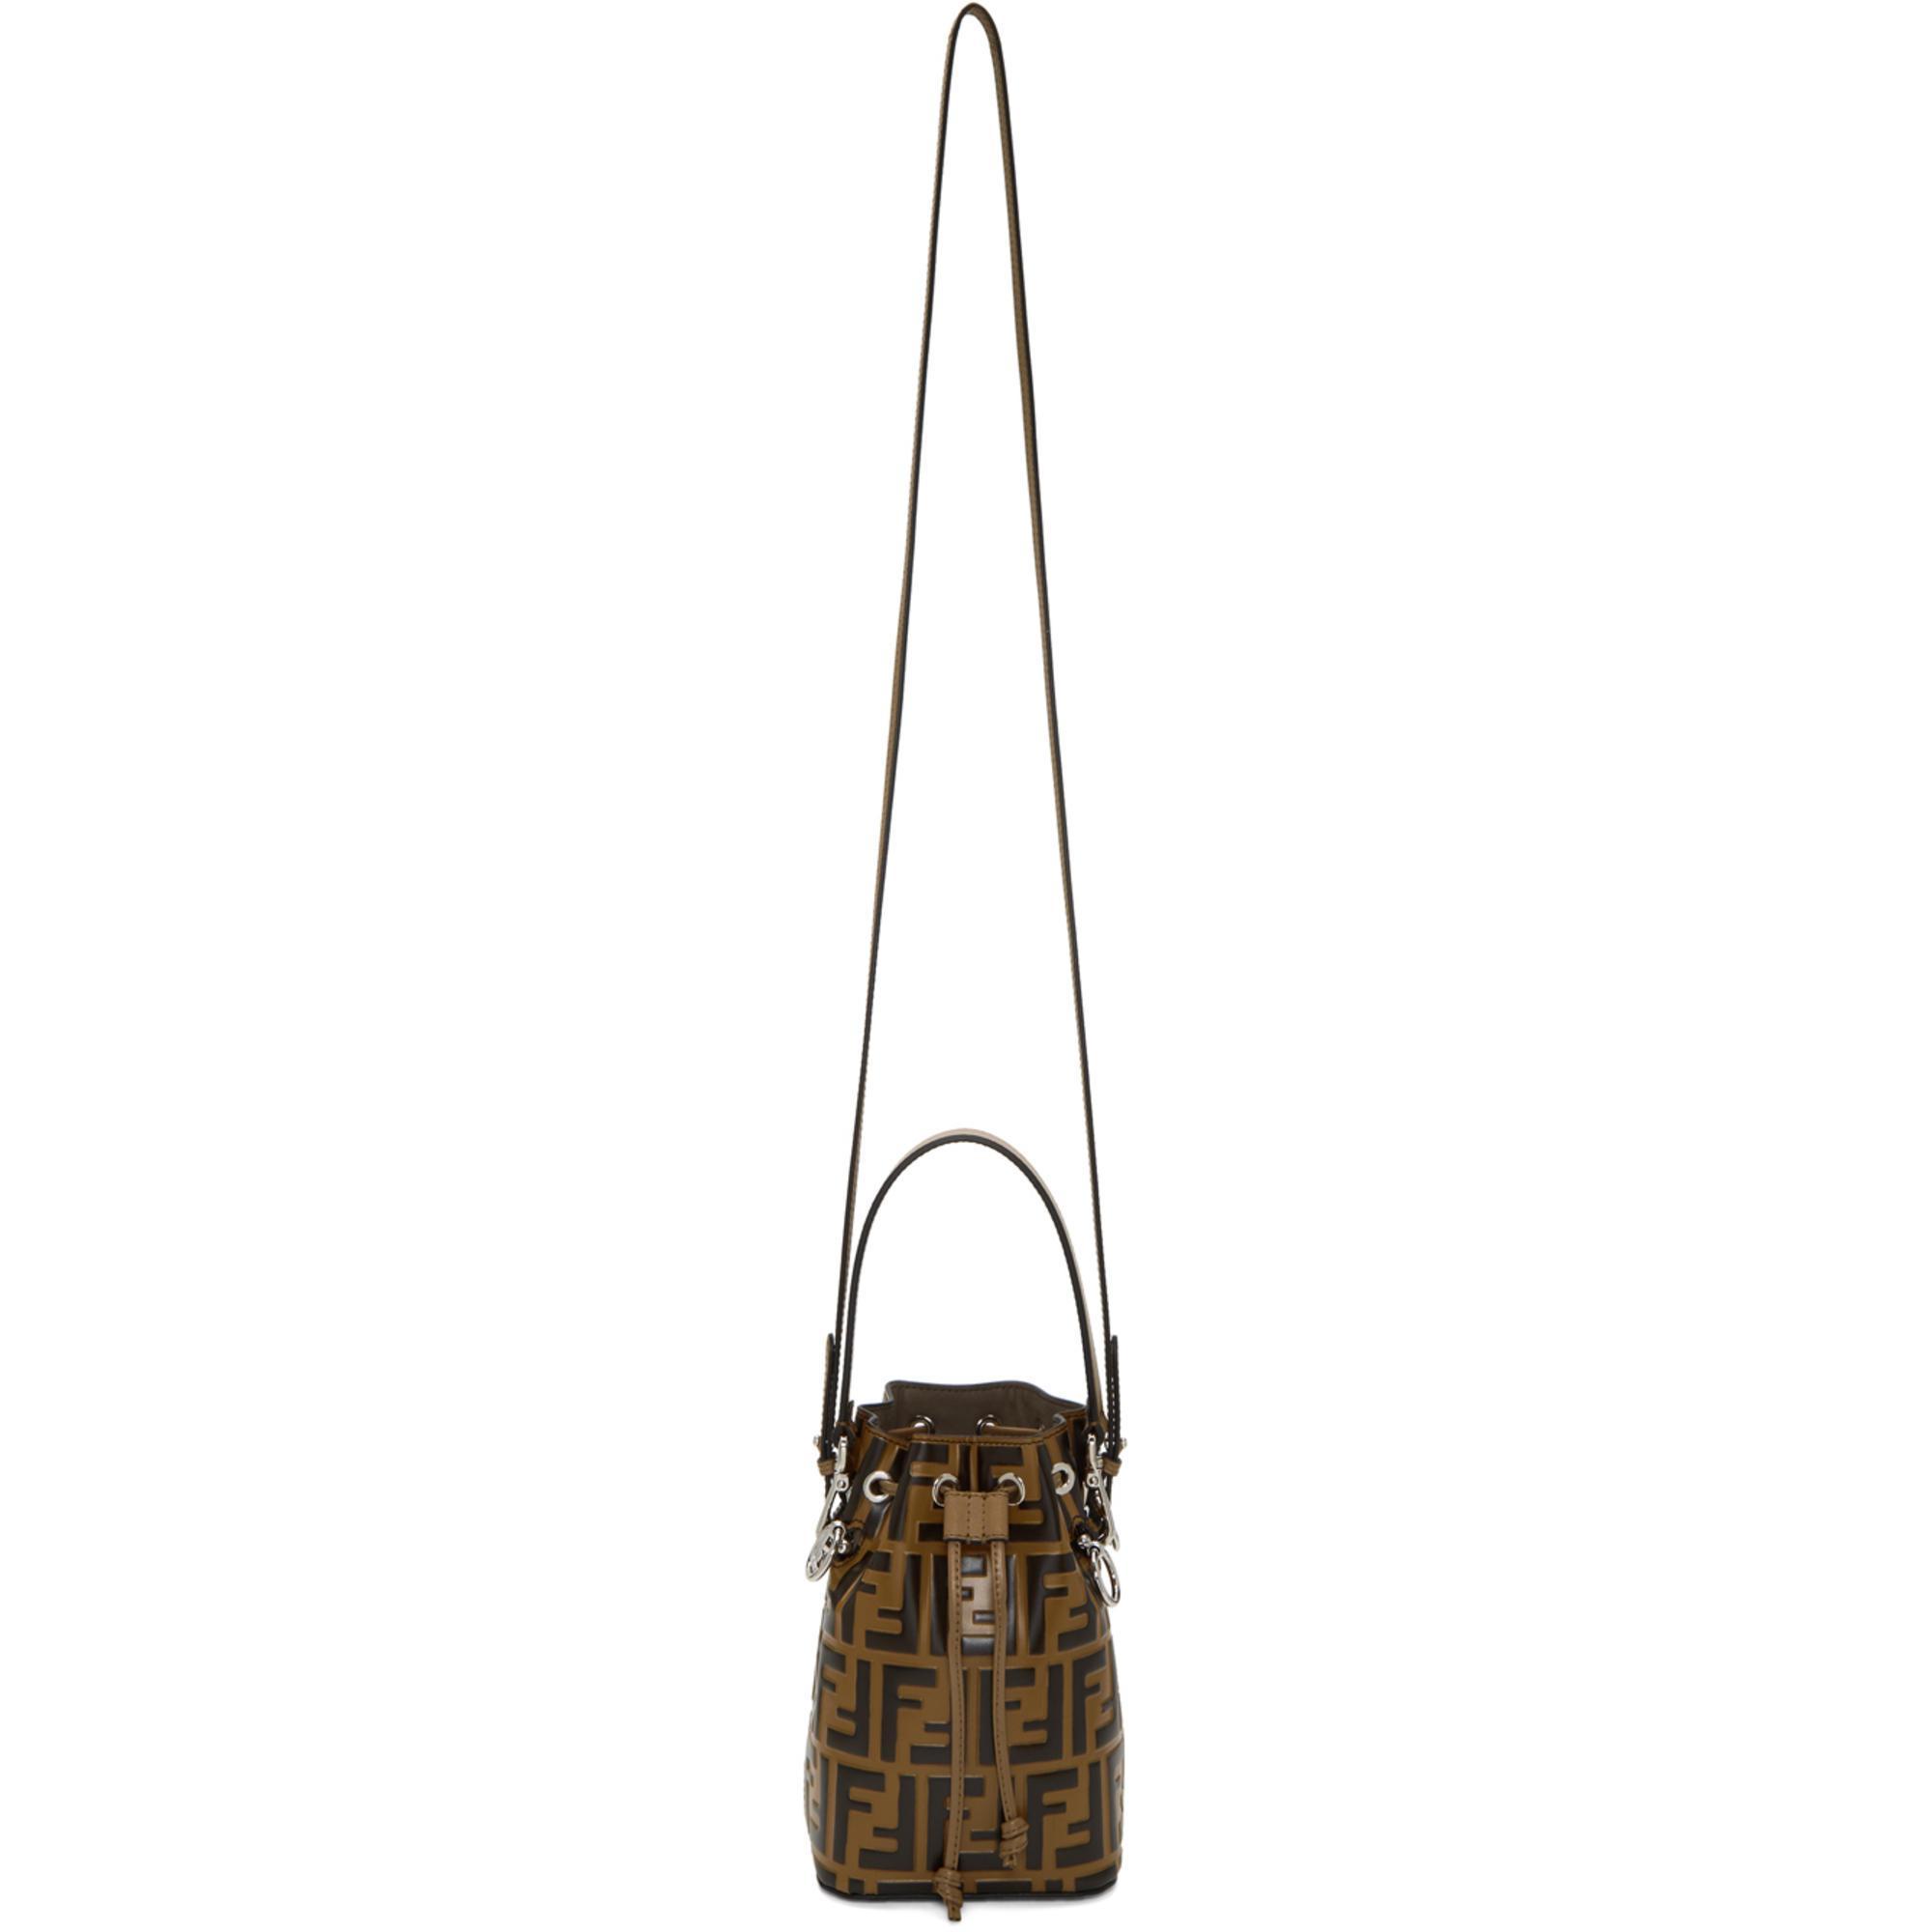 9e2bf5542a03 Fendi Brown And Black Mini Mon Tresor Forever Bag in Brown - Lyst